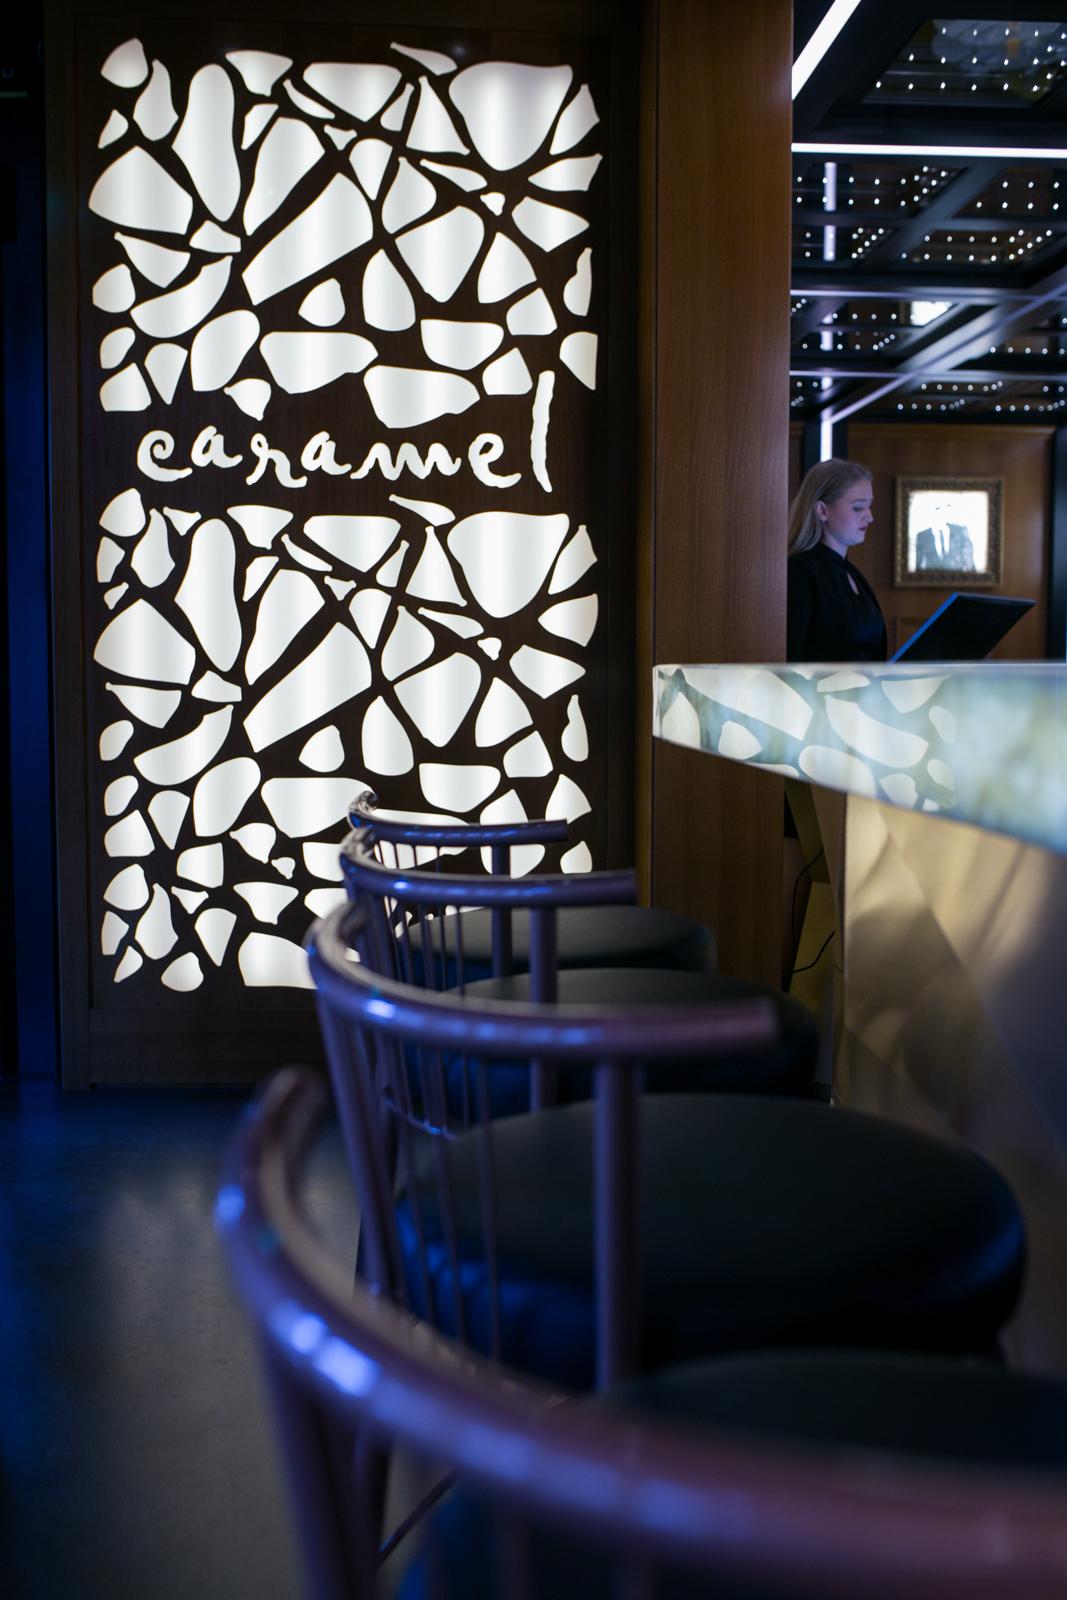 Caramel-restaurant-and-lounge-london-abu-dabi-dubai-oman-new-restaurant-in-london-minas-planet-review-jasmina-haskovic2.jpg